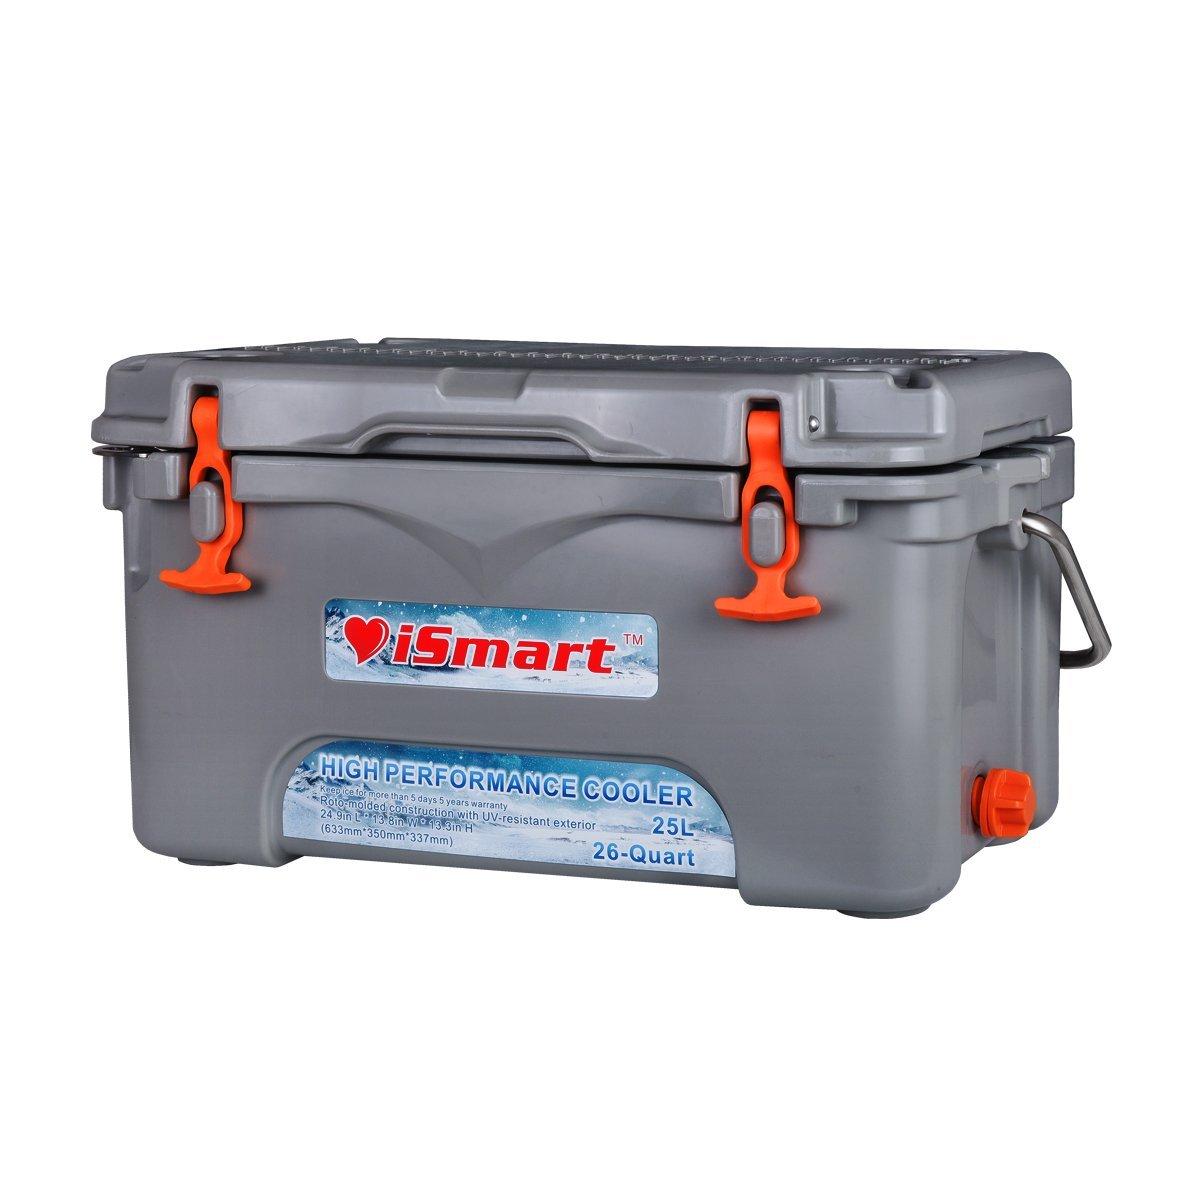 iSmart 26 Quart Ice Chest Rotomolded Best Cooler Box with Bottle Opener